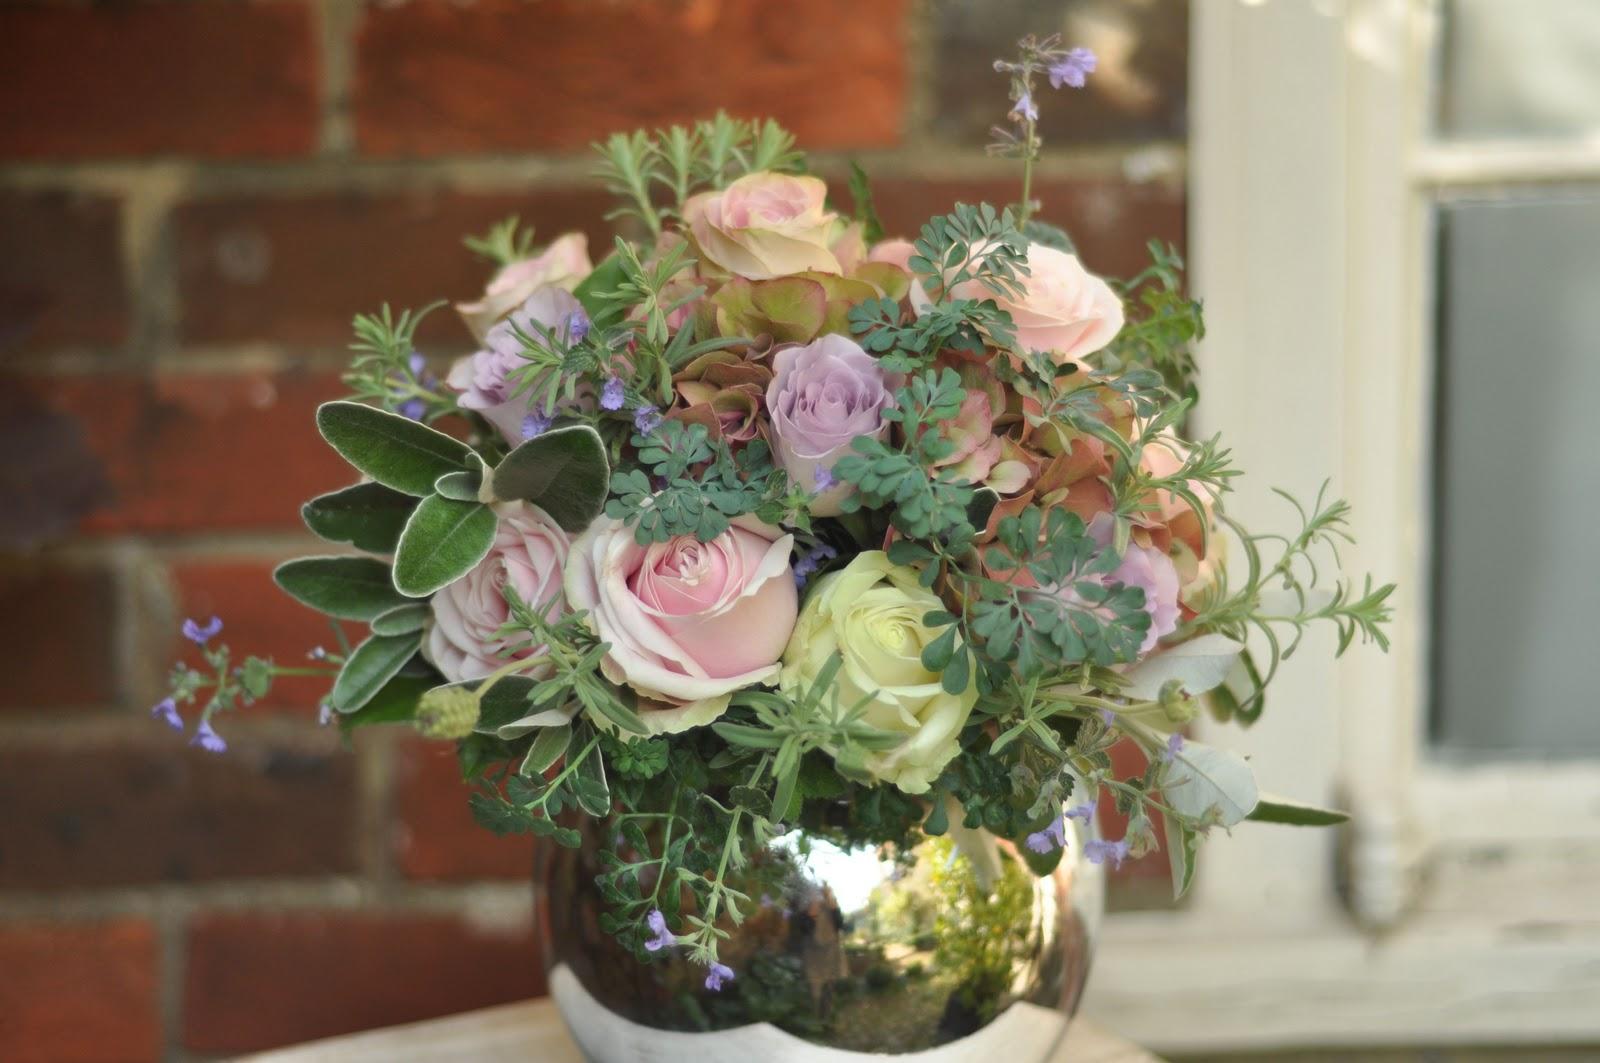 Spriggs Florist Roses Memeory Lane Sweet Avalanche Upper Secret